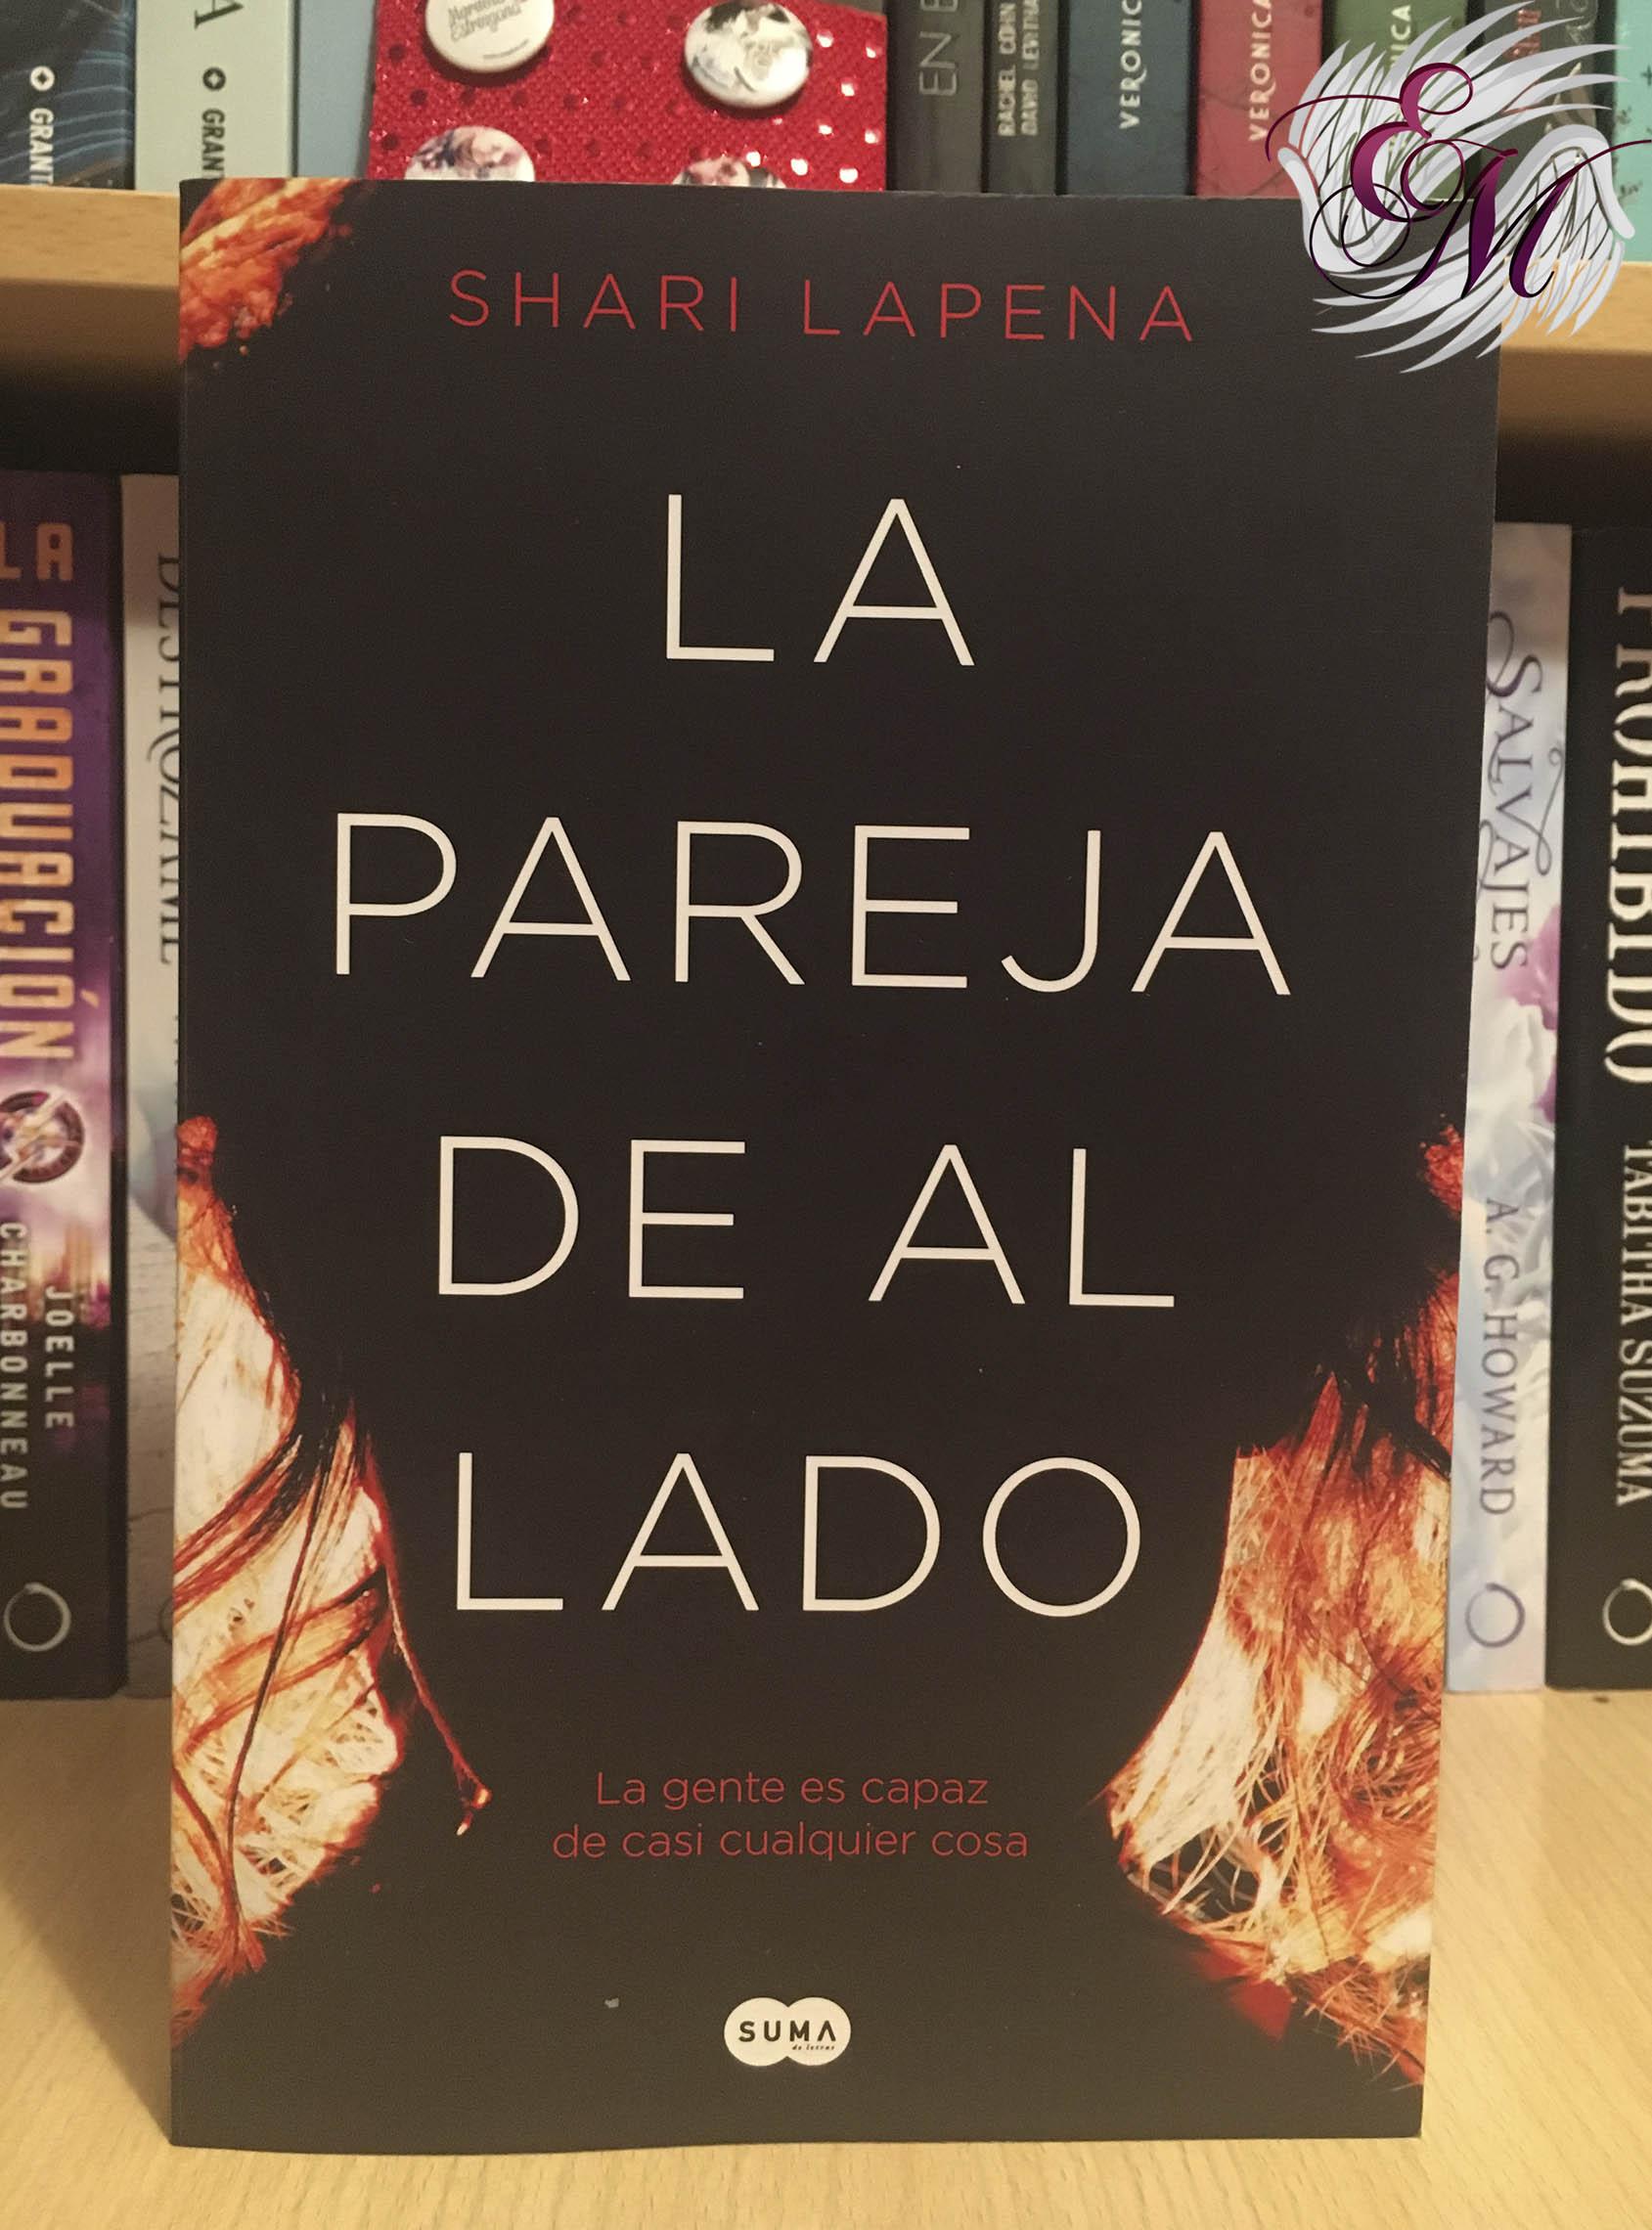 La pareja de al lado, de Shari Lapena - Reseña